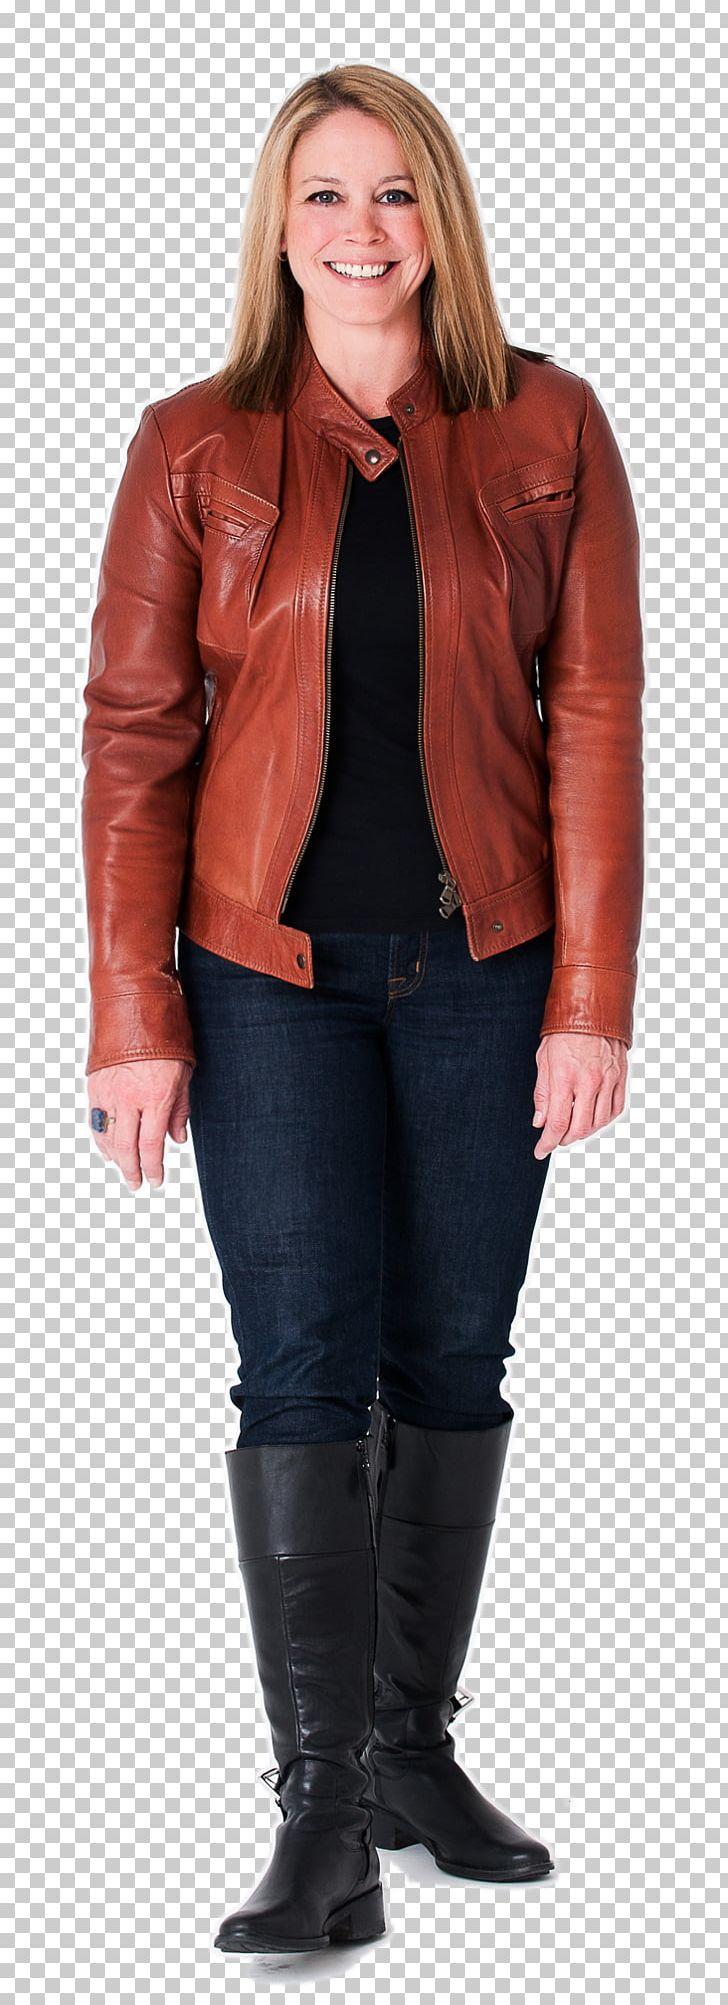 Denise Rocha B3J 0B3 Information Jacket PNG, Clipart, B3j 0b3, Denise Rocha, Email, Girl, Halifax Regional Municipality Free PNG Download